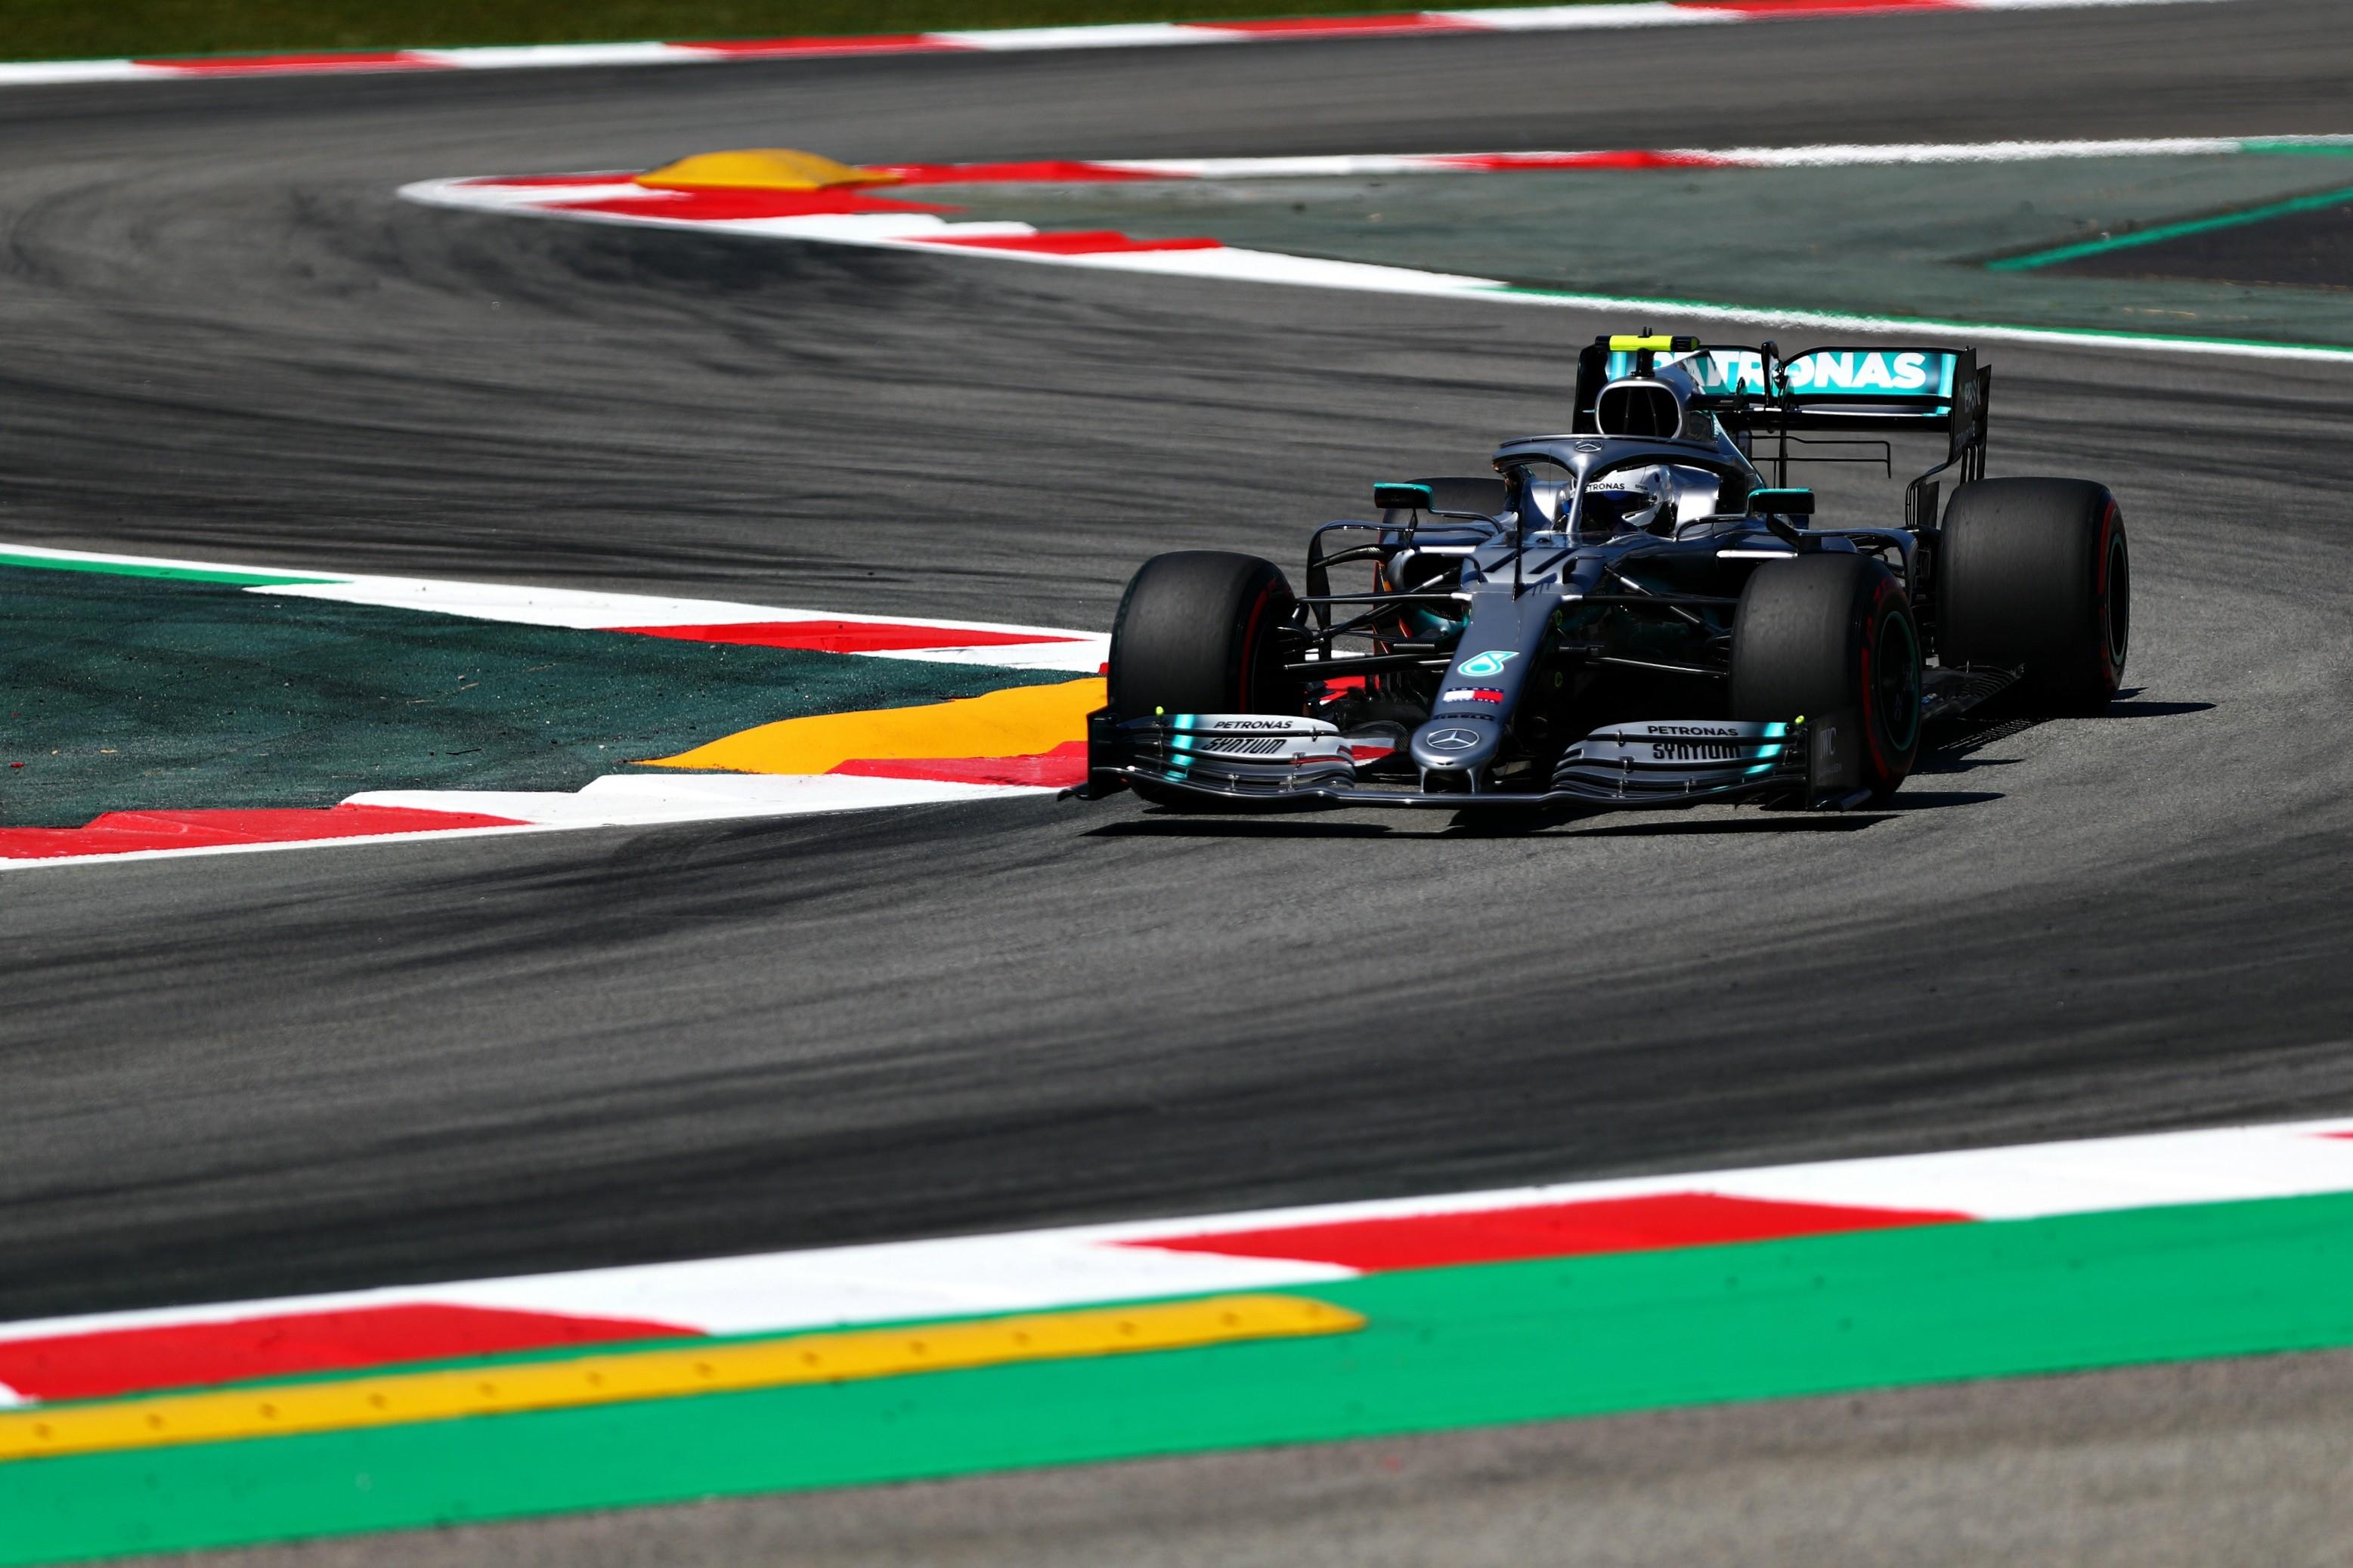 Valtteri Bottas (Mercedes) au Grand Prix d'Espagne 2019